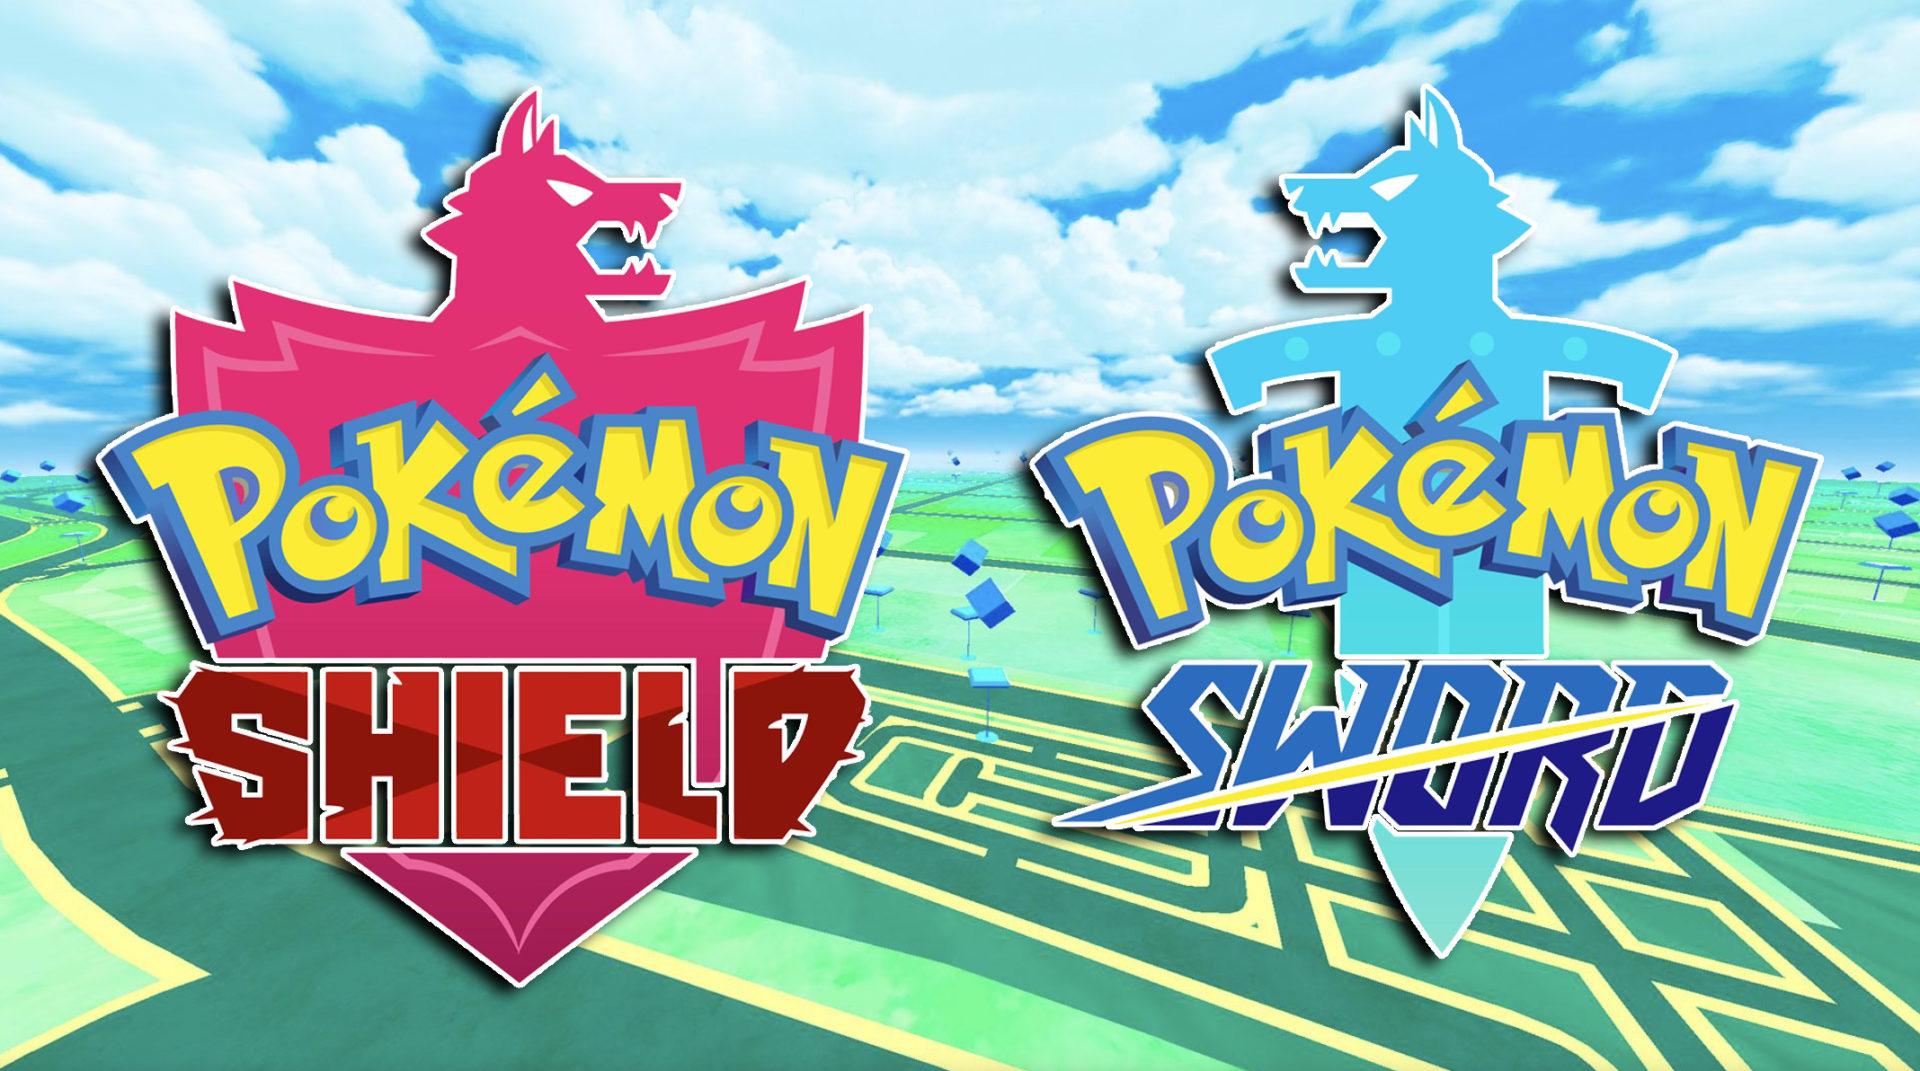 Screenshot of Pokemon Sword & Shield logo over Go background.